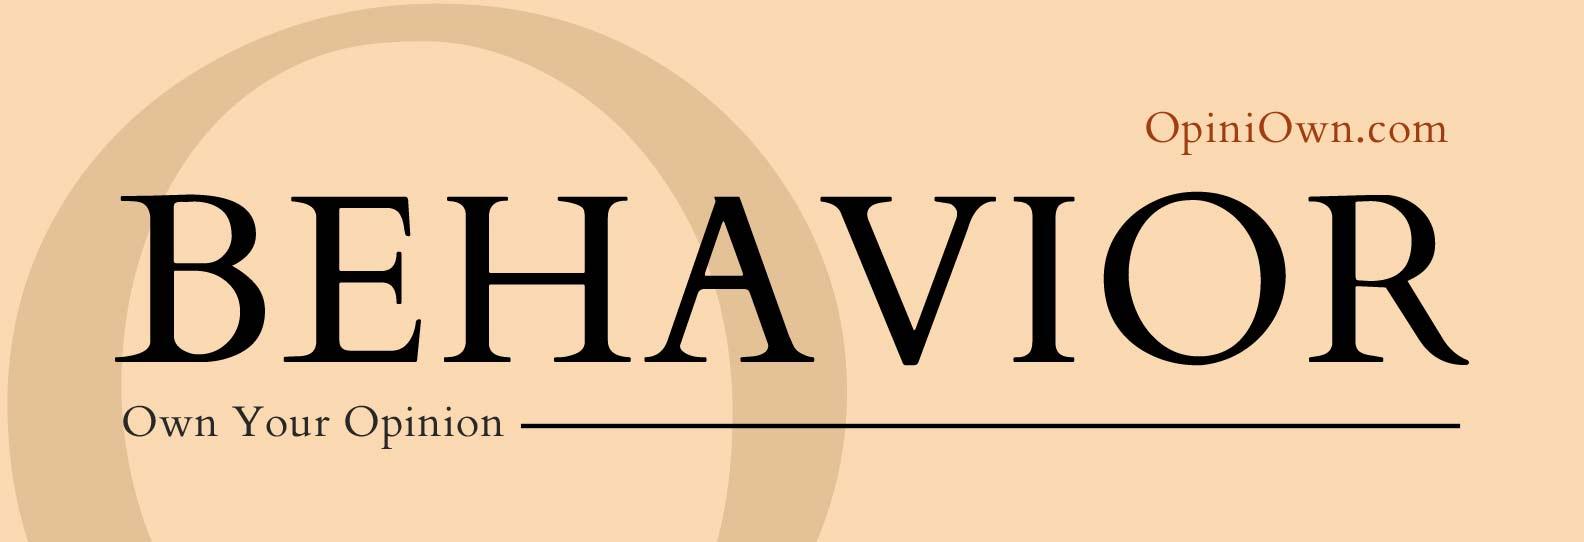 20-05-13---BEHAVIOR-header